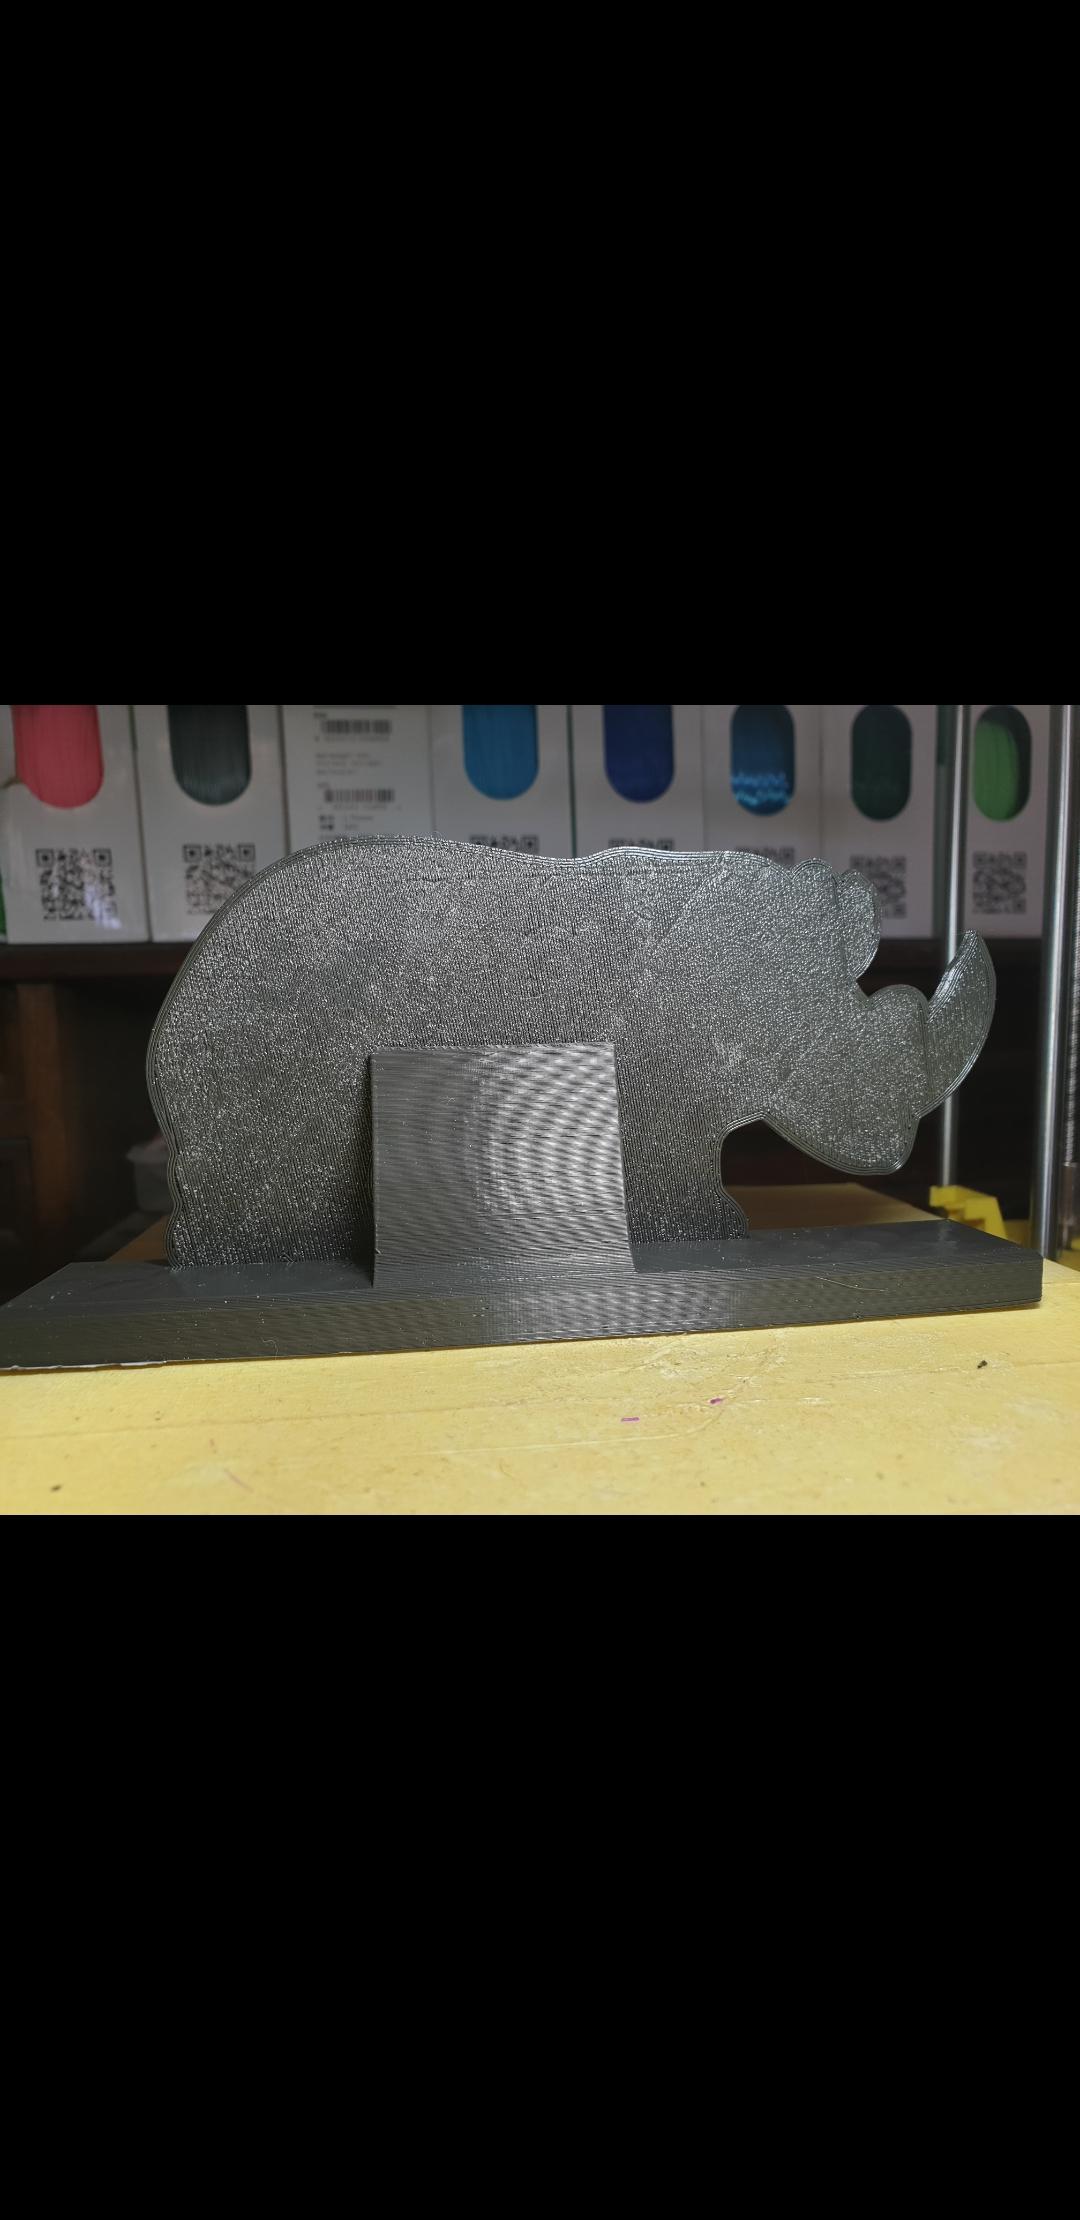 Screenshot_20190930-123327_Gallery.jpg Download free STL file Rhinoceros Puzzle • Template to 3D print, Renee_Taylor